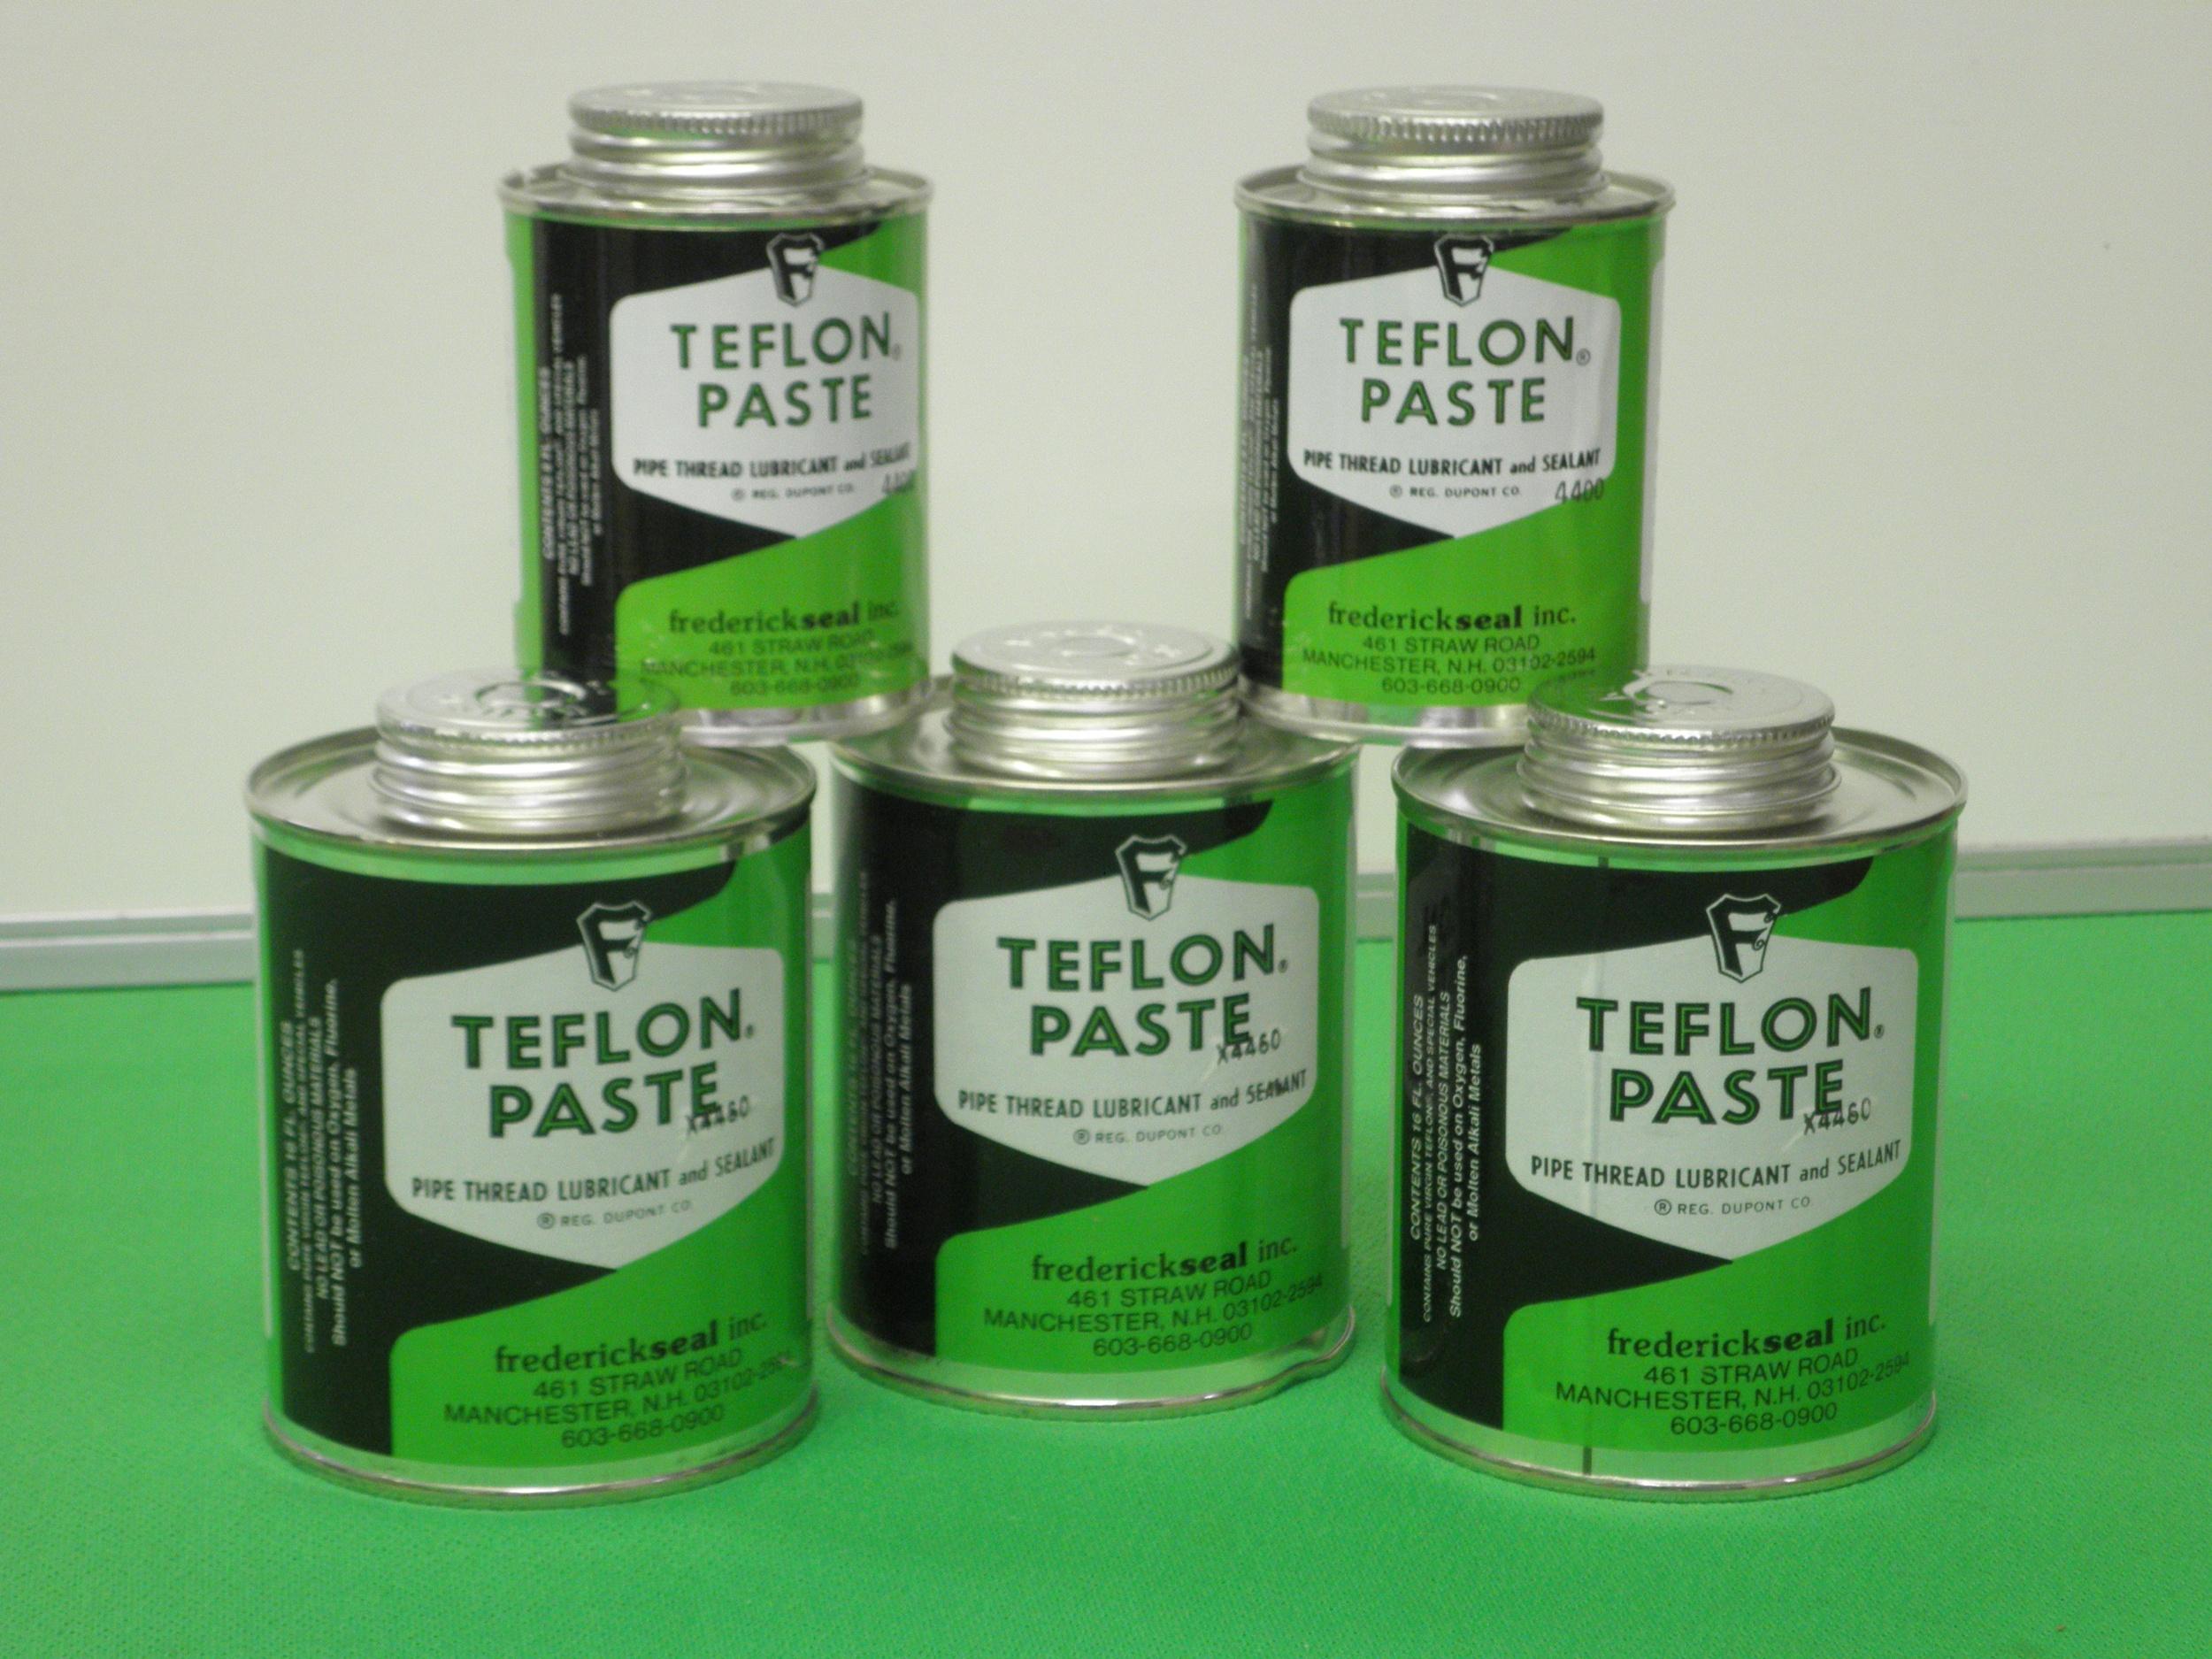 Teflon Paste Shop Ferederickseal